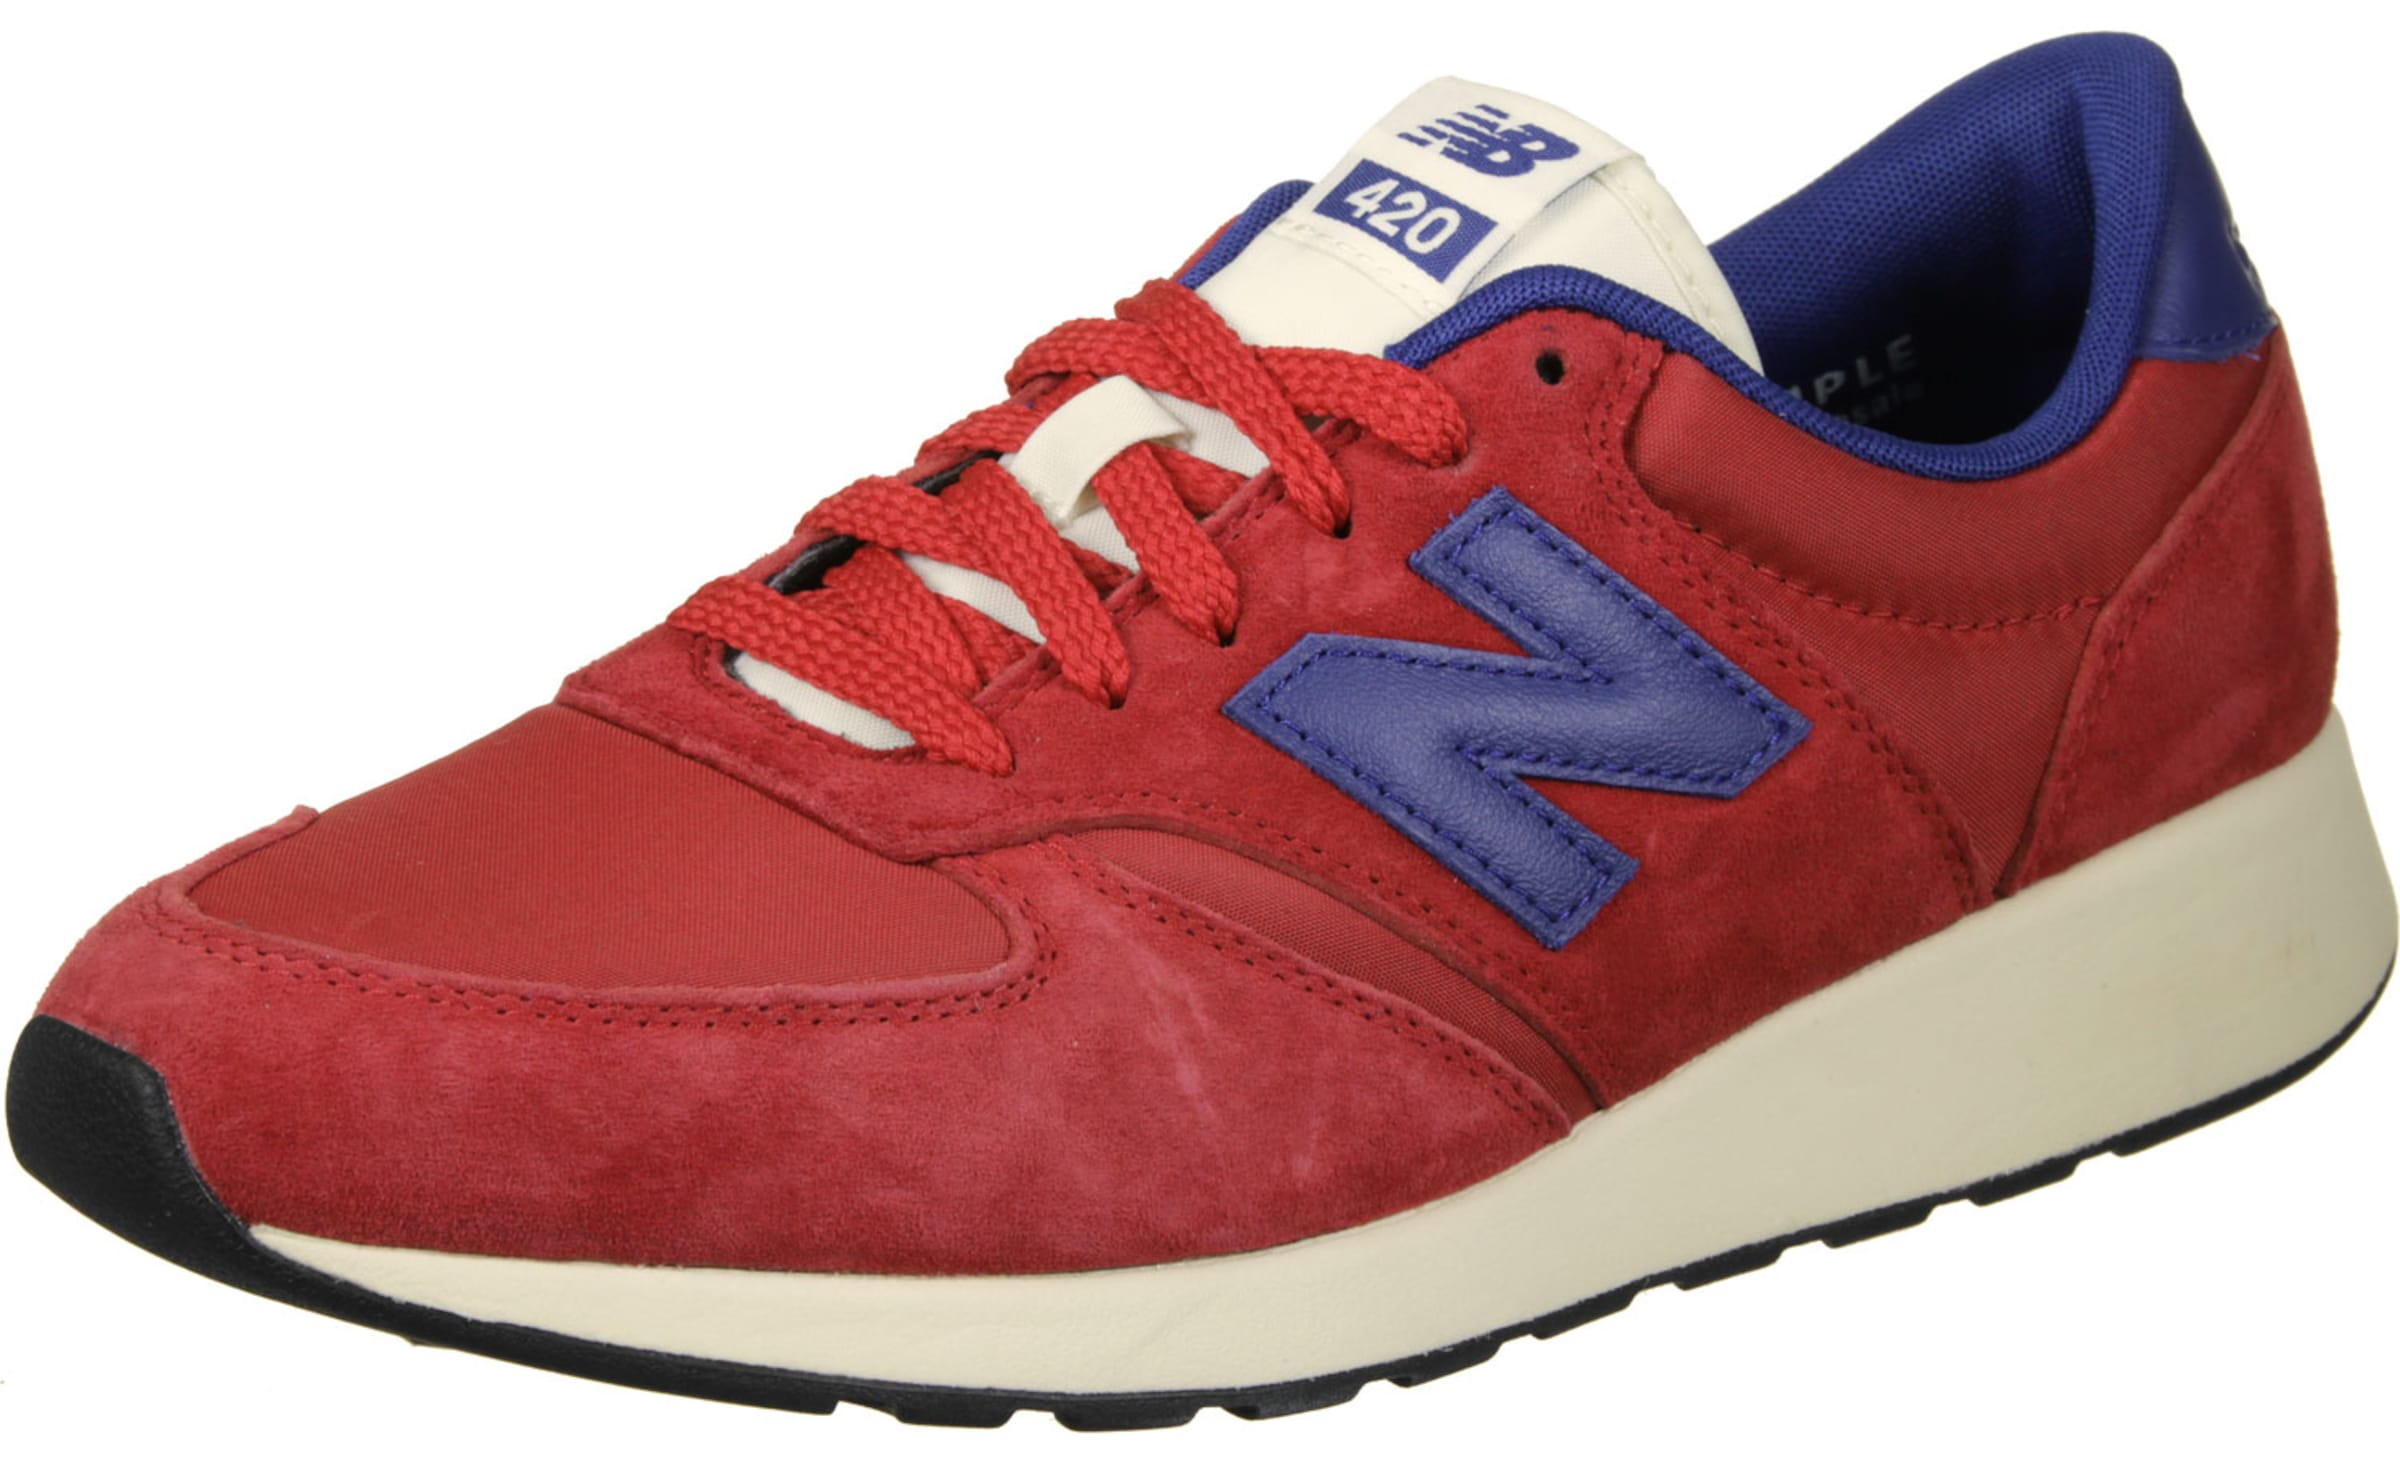 BlauGold Balance Sneaker In 'mrl420' New Weiß Iyvm76Ybfg